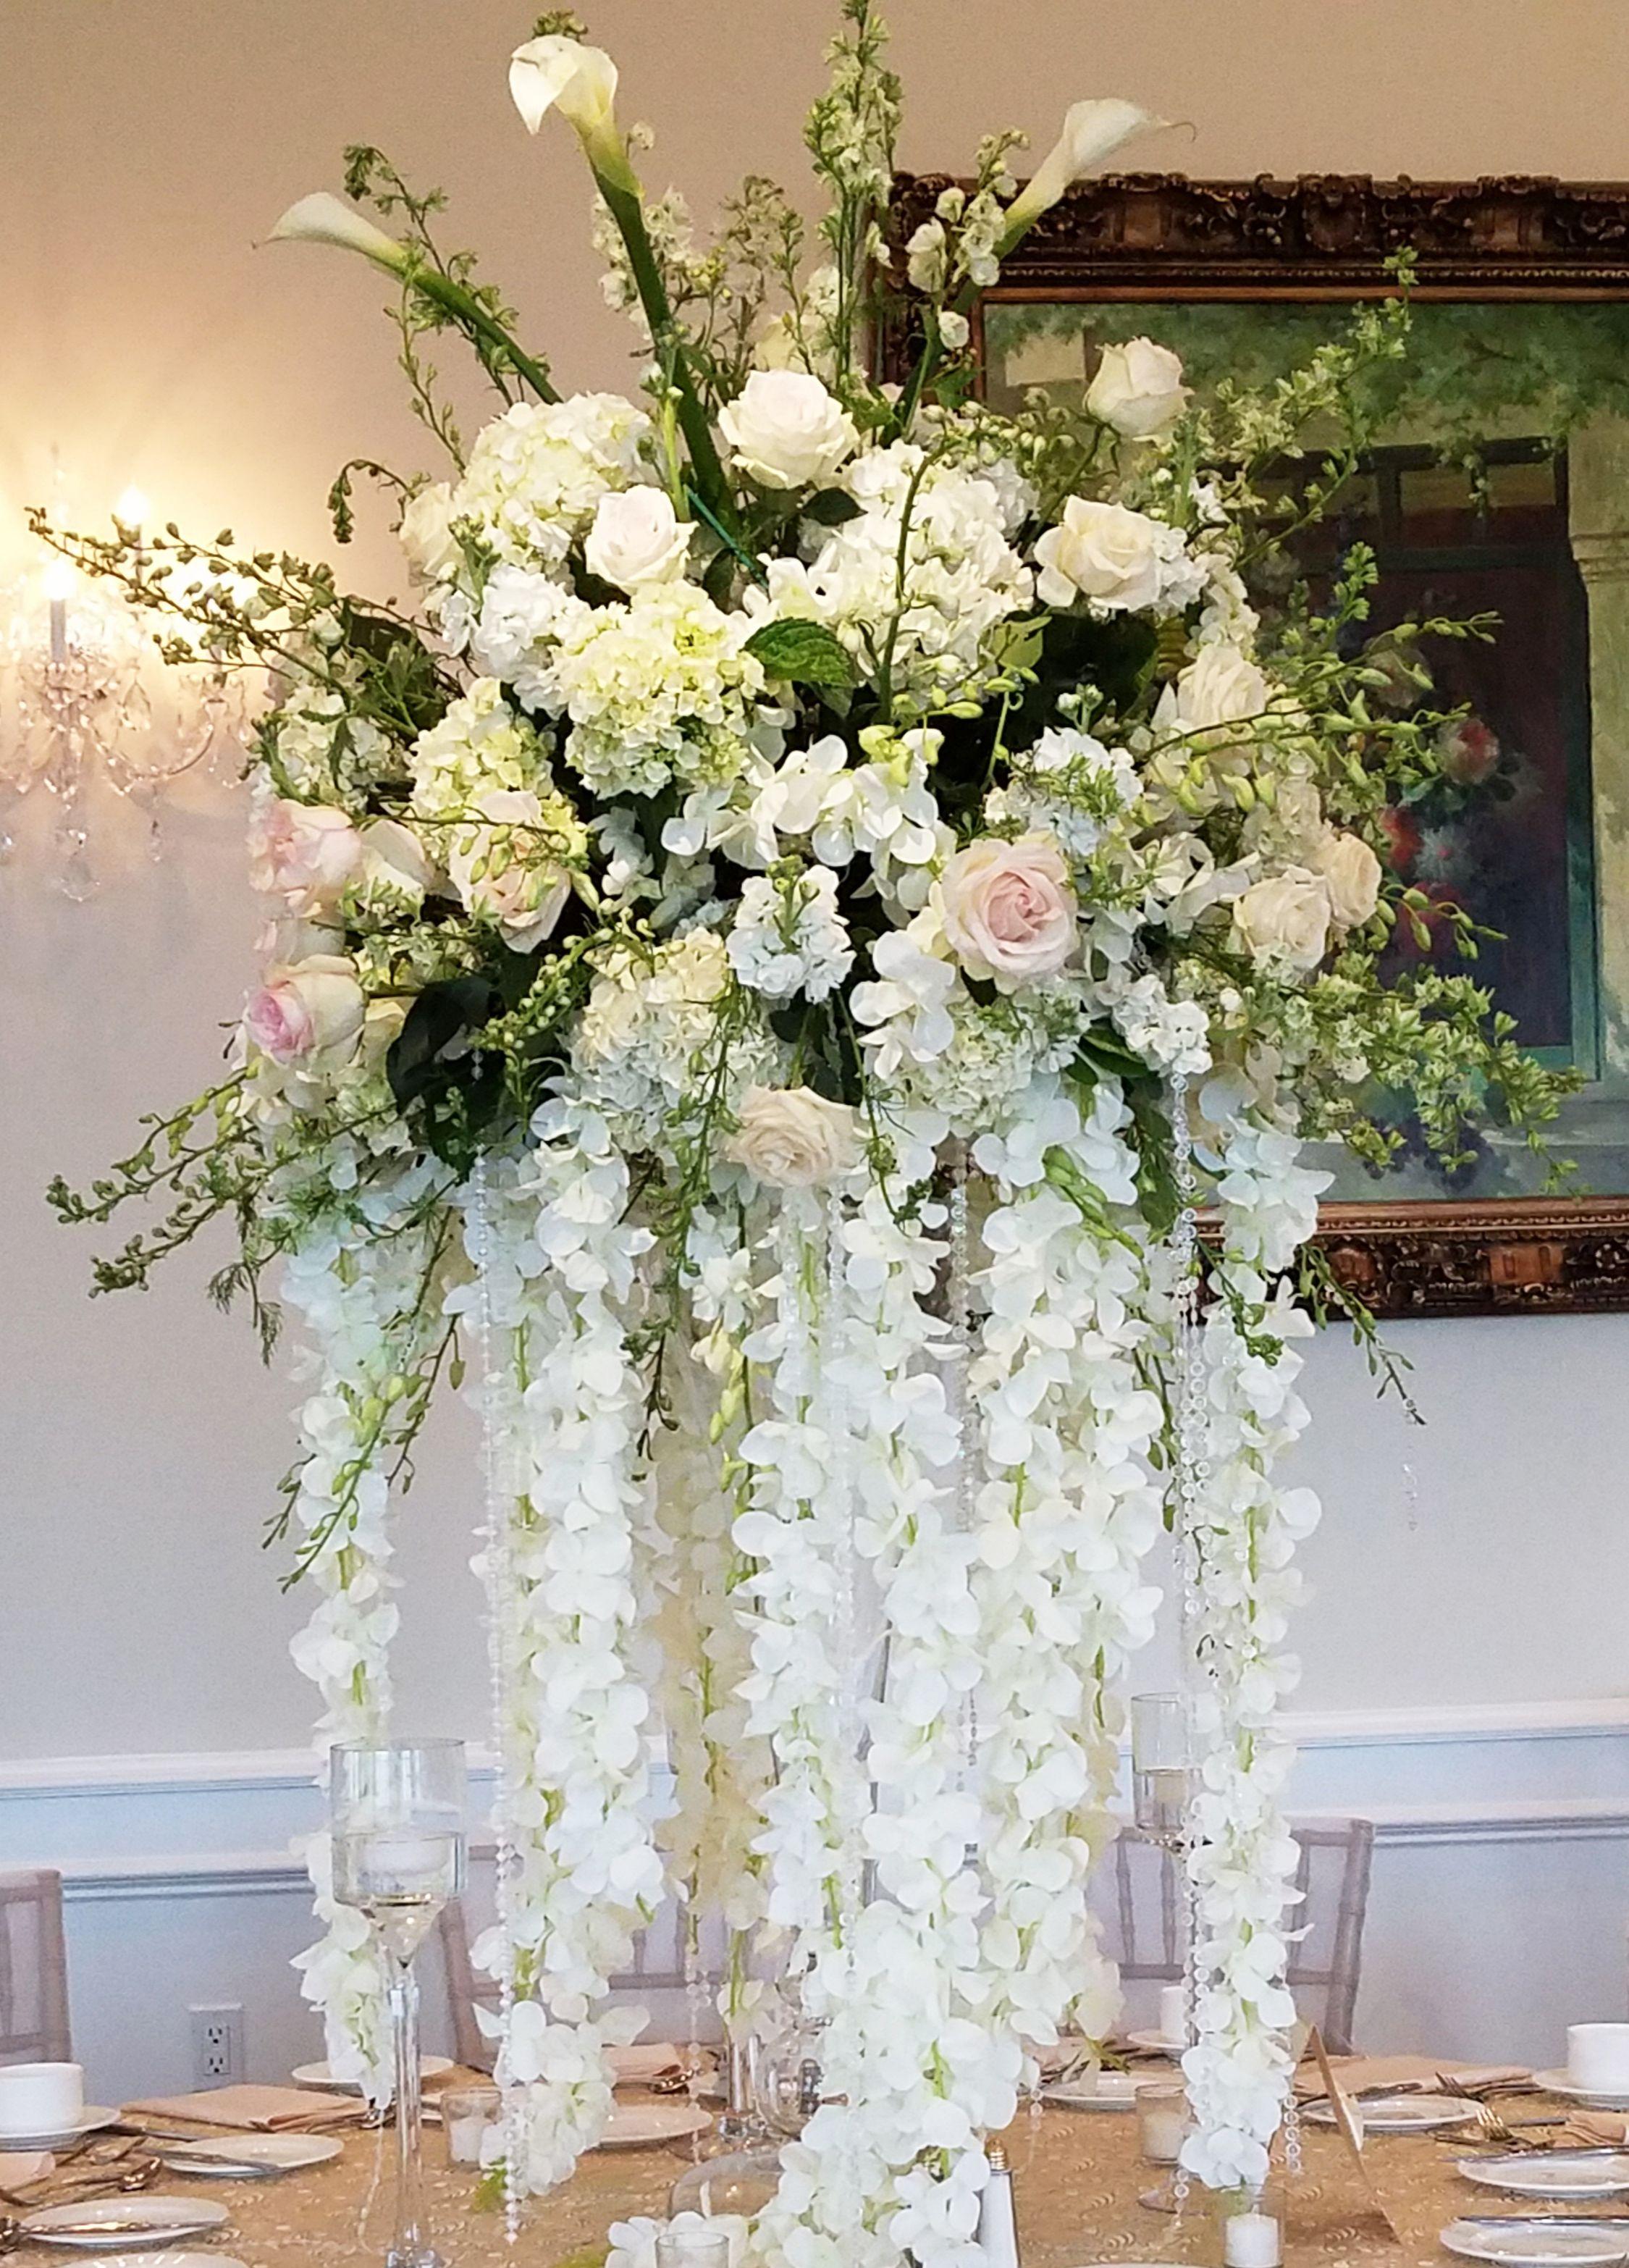 Swell Stunning Centerpiece Of Calla Lilies Roses Hydrangea Download Free Architecture Designs Scobabritishbridgeorg